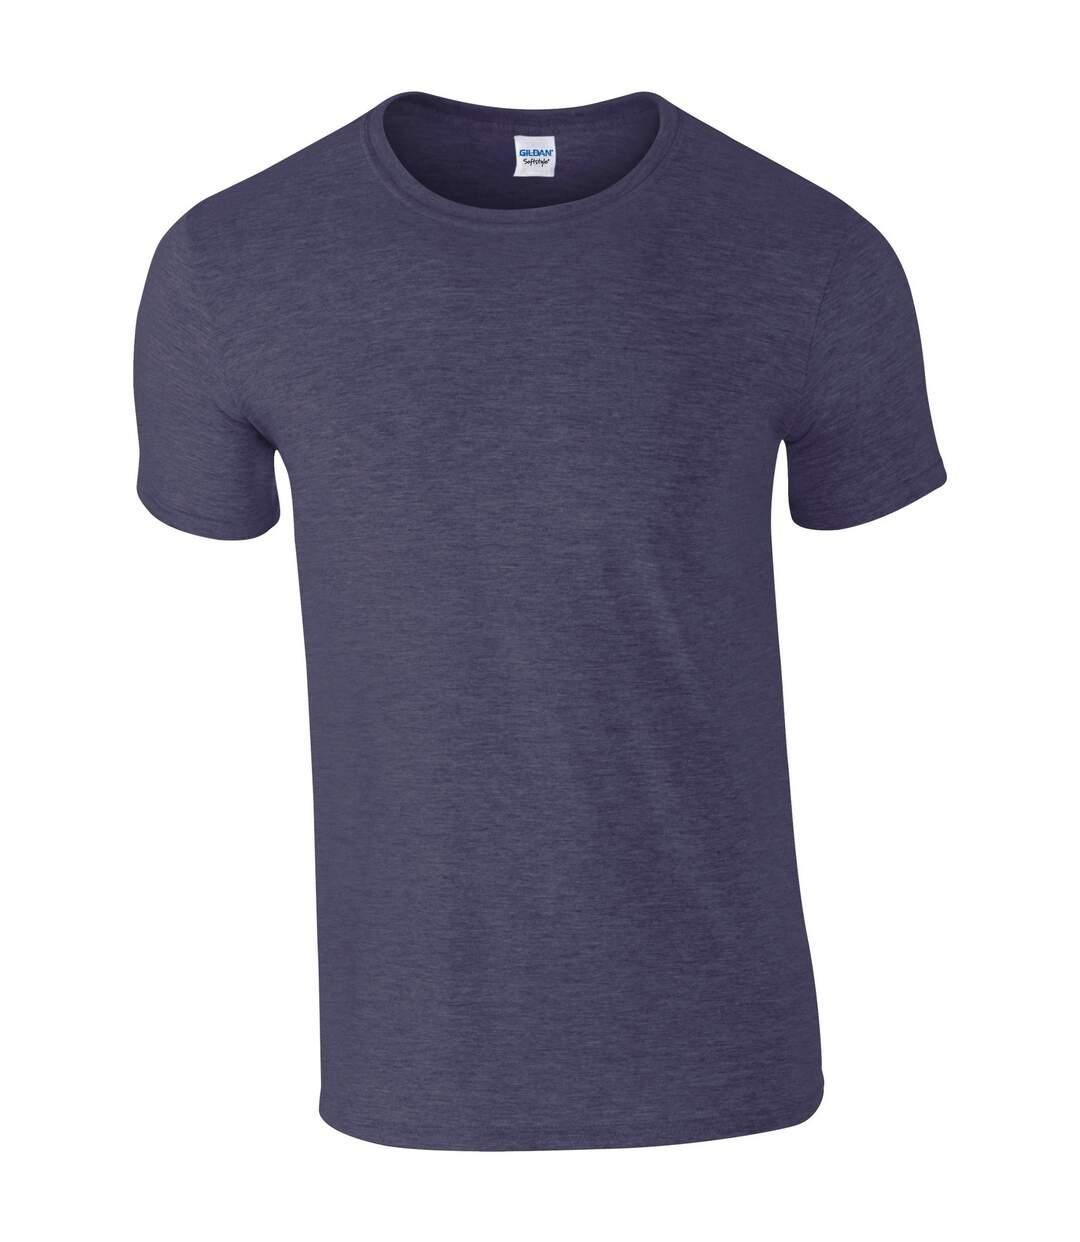 Gildan Mens Short Sleeve Soft-Style T-Shirt (Black) - UTBC484